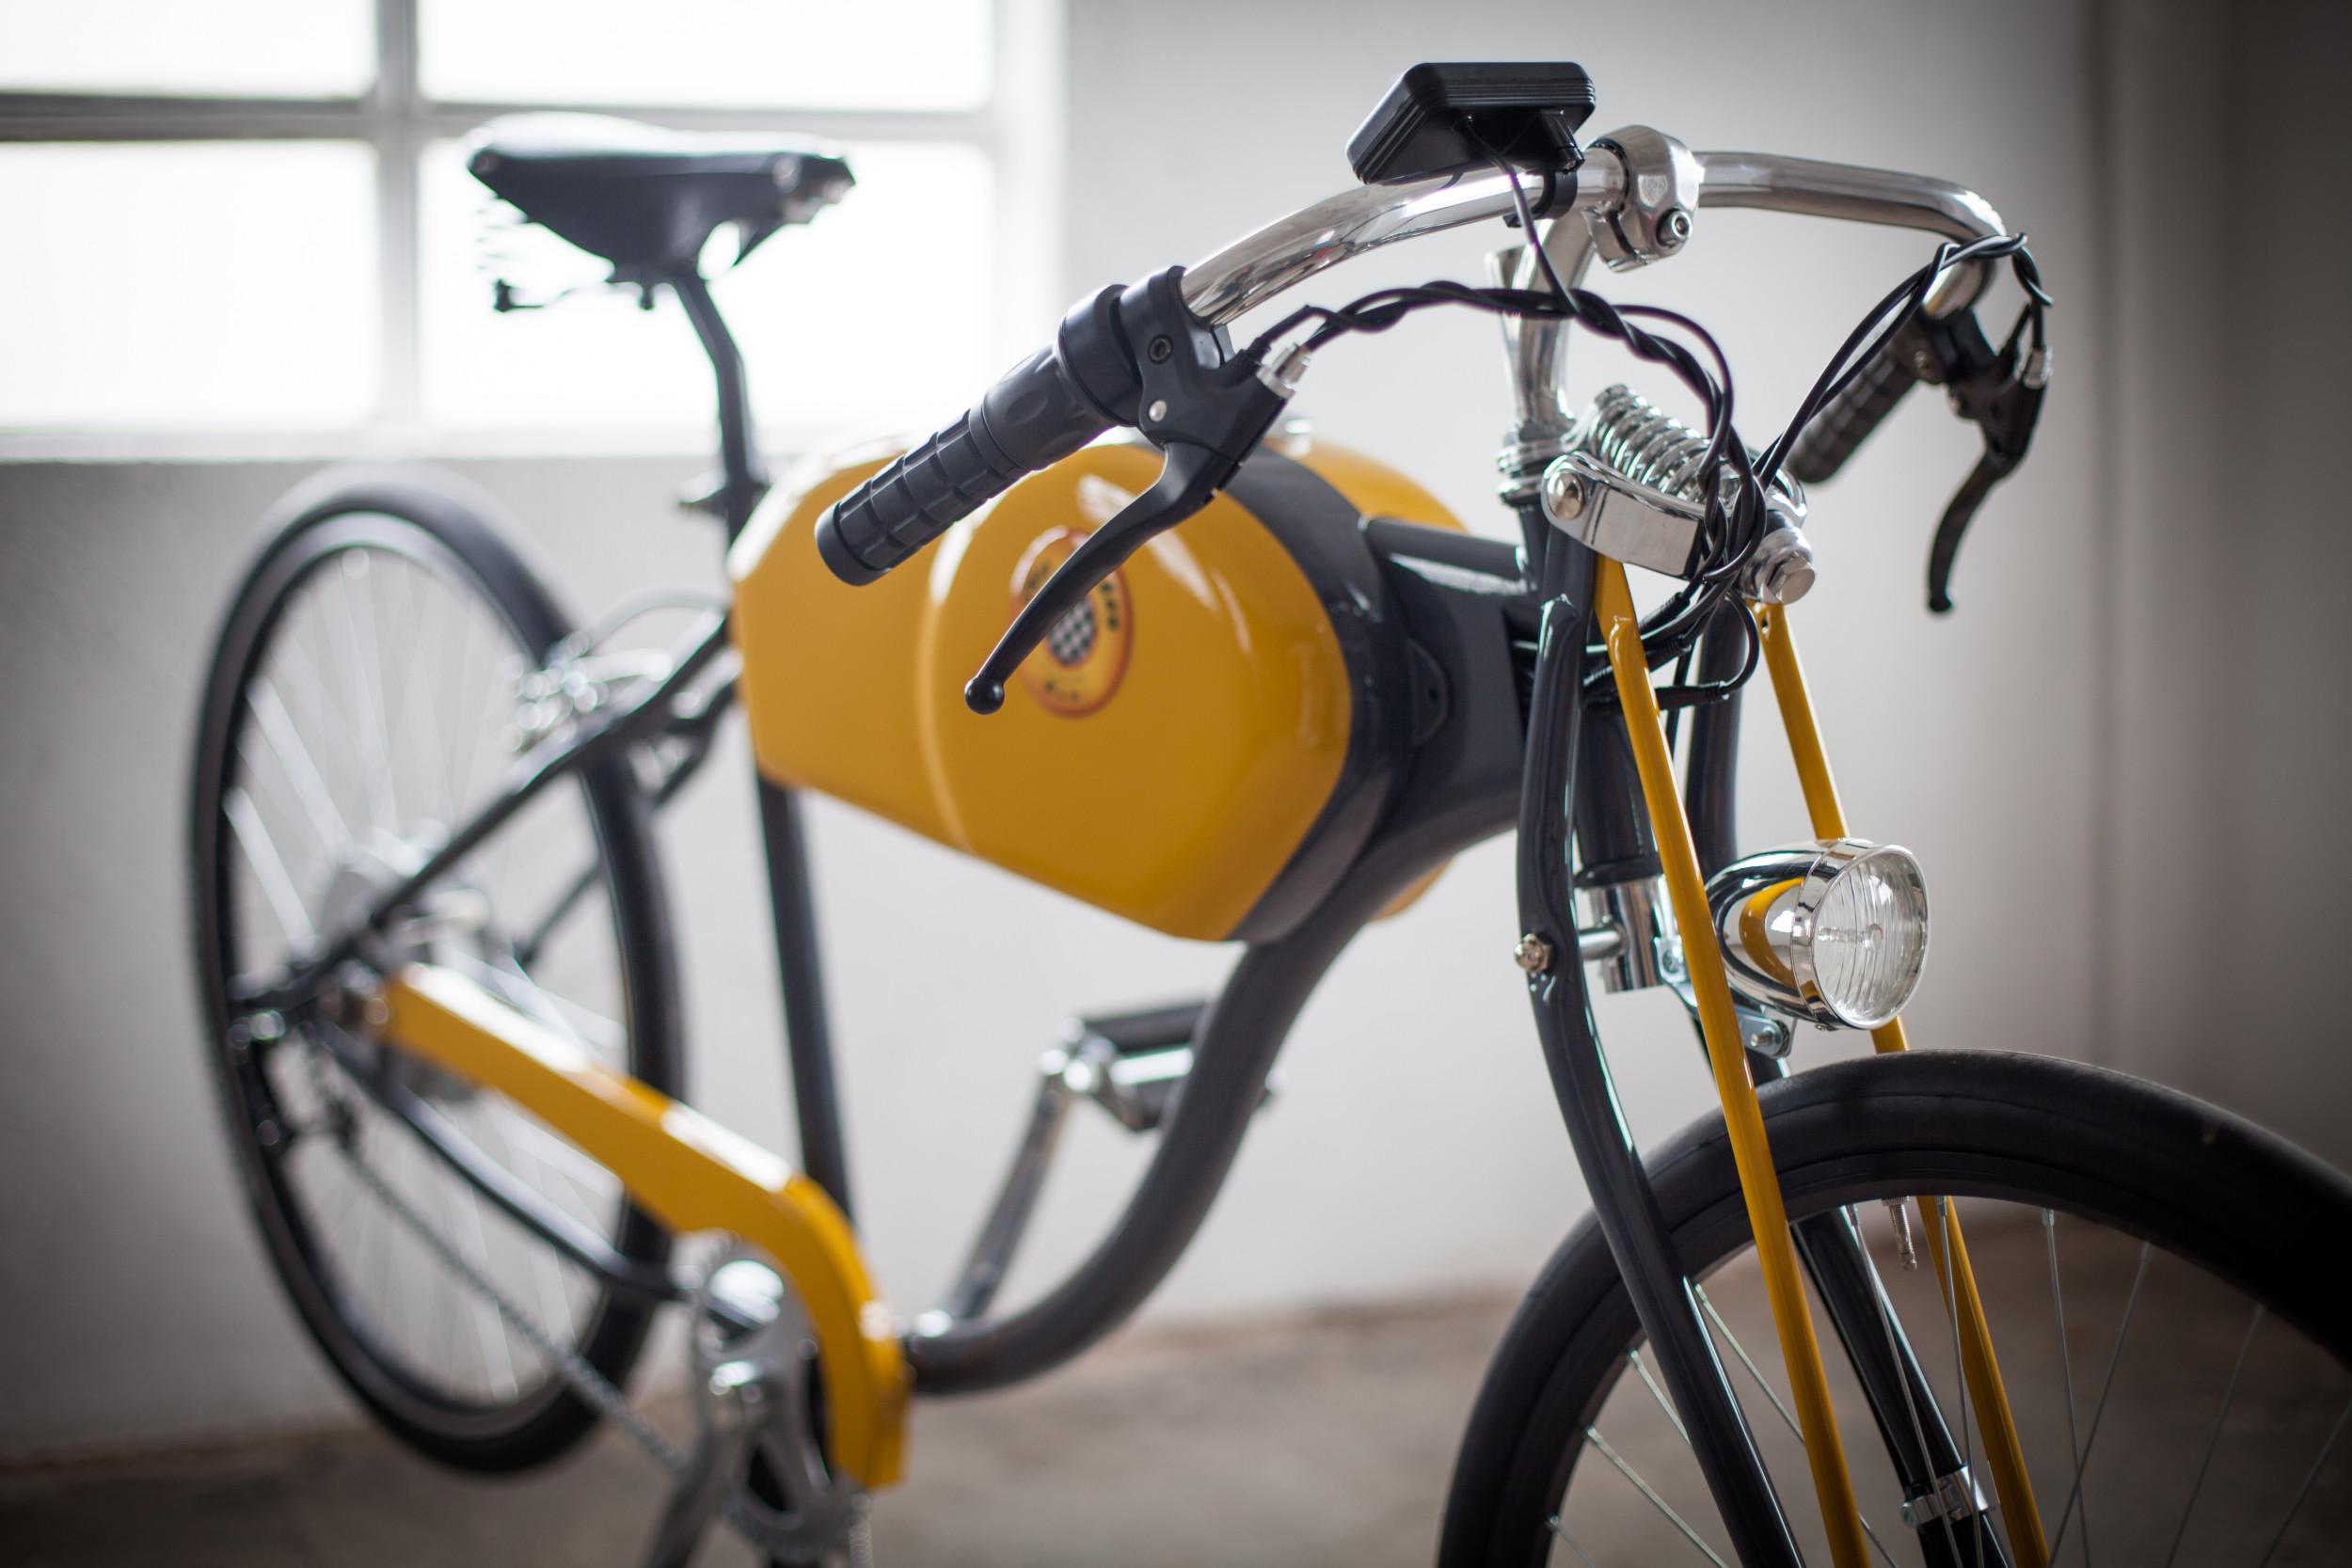 OtoK-Y-2-bike